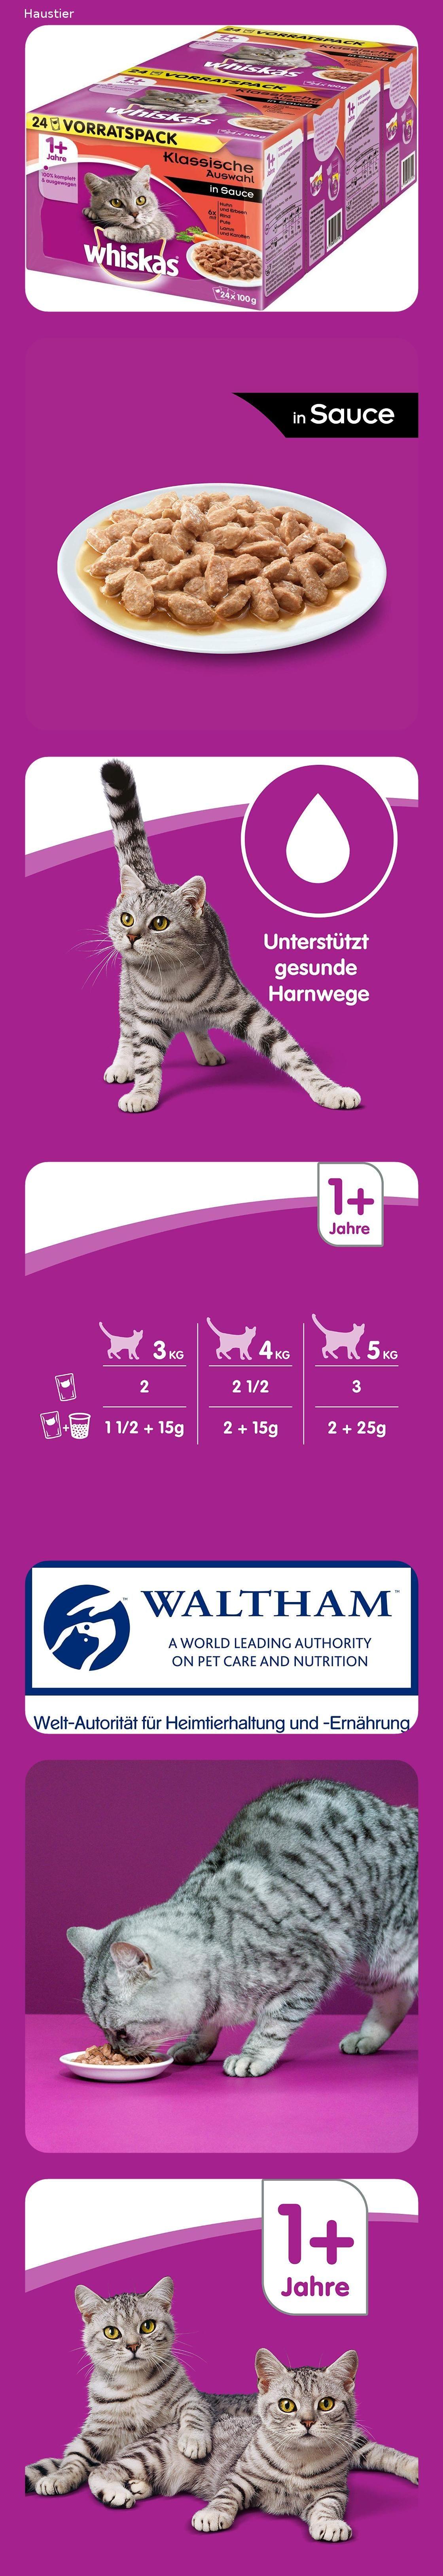 Whiskas 1 Katzenfutter Hochwertiges Nassfutter Fur Gesundes